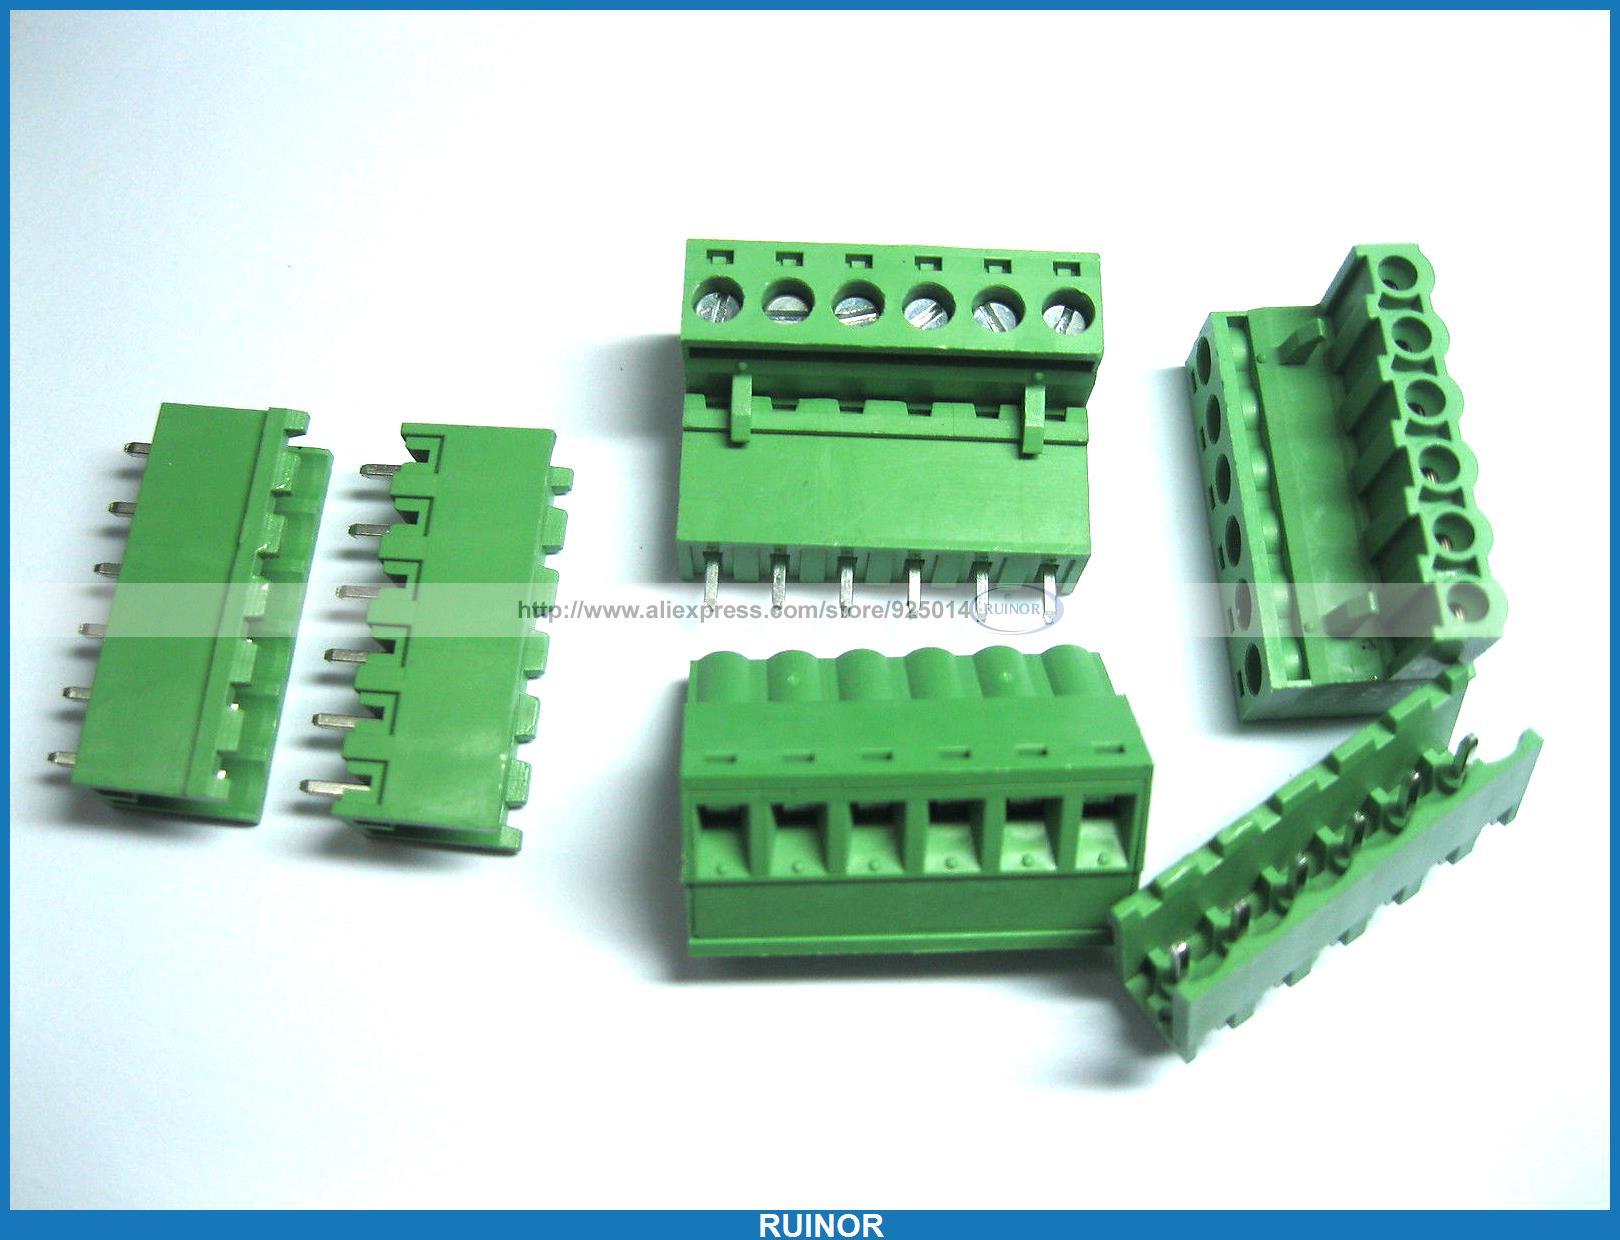 60 Pcs Green 6 Pin 5 08mm Screw Terminal Block Connector Pluggable Type 30 pcs screw terminal block connector 3 81mm 12 pin green pluggable type